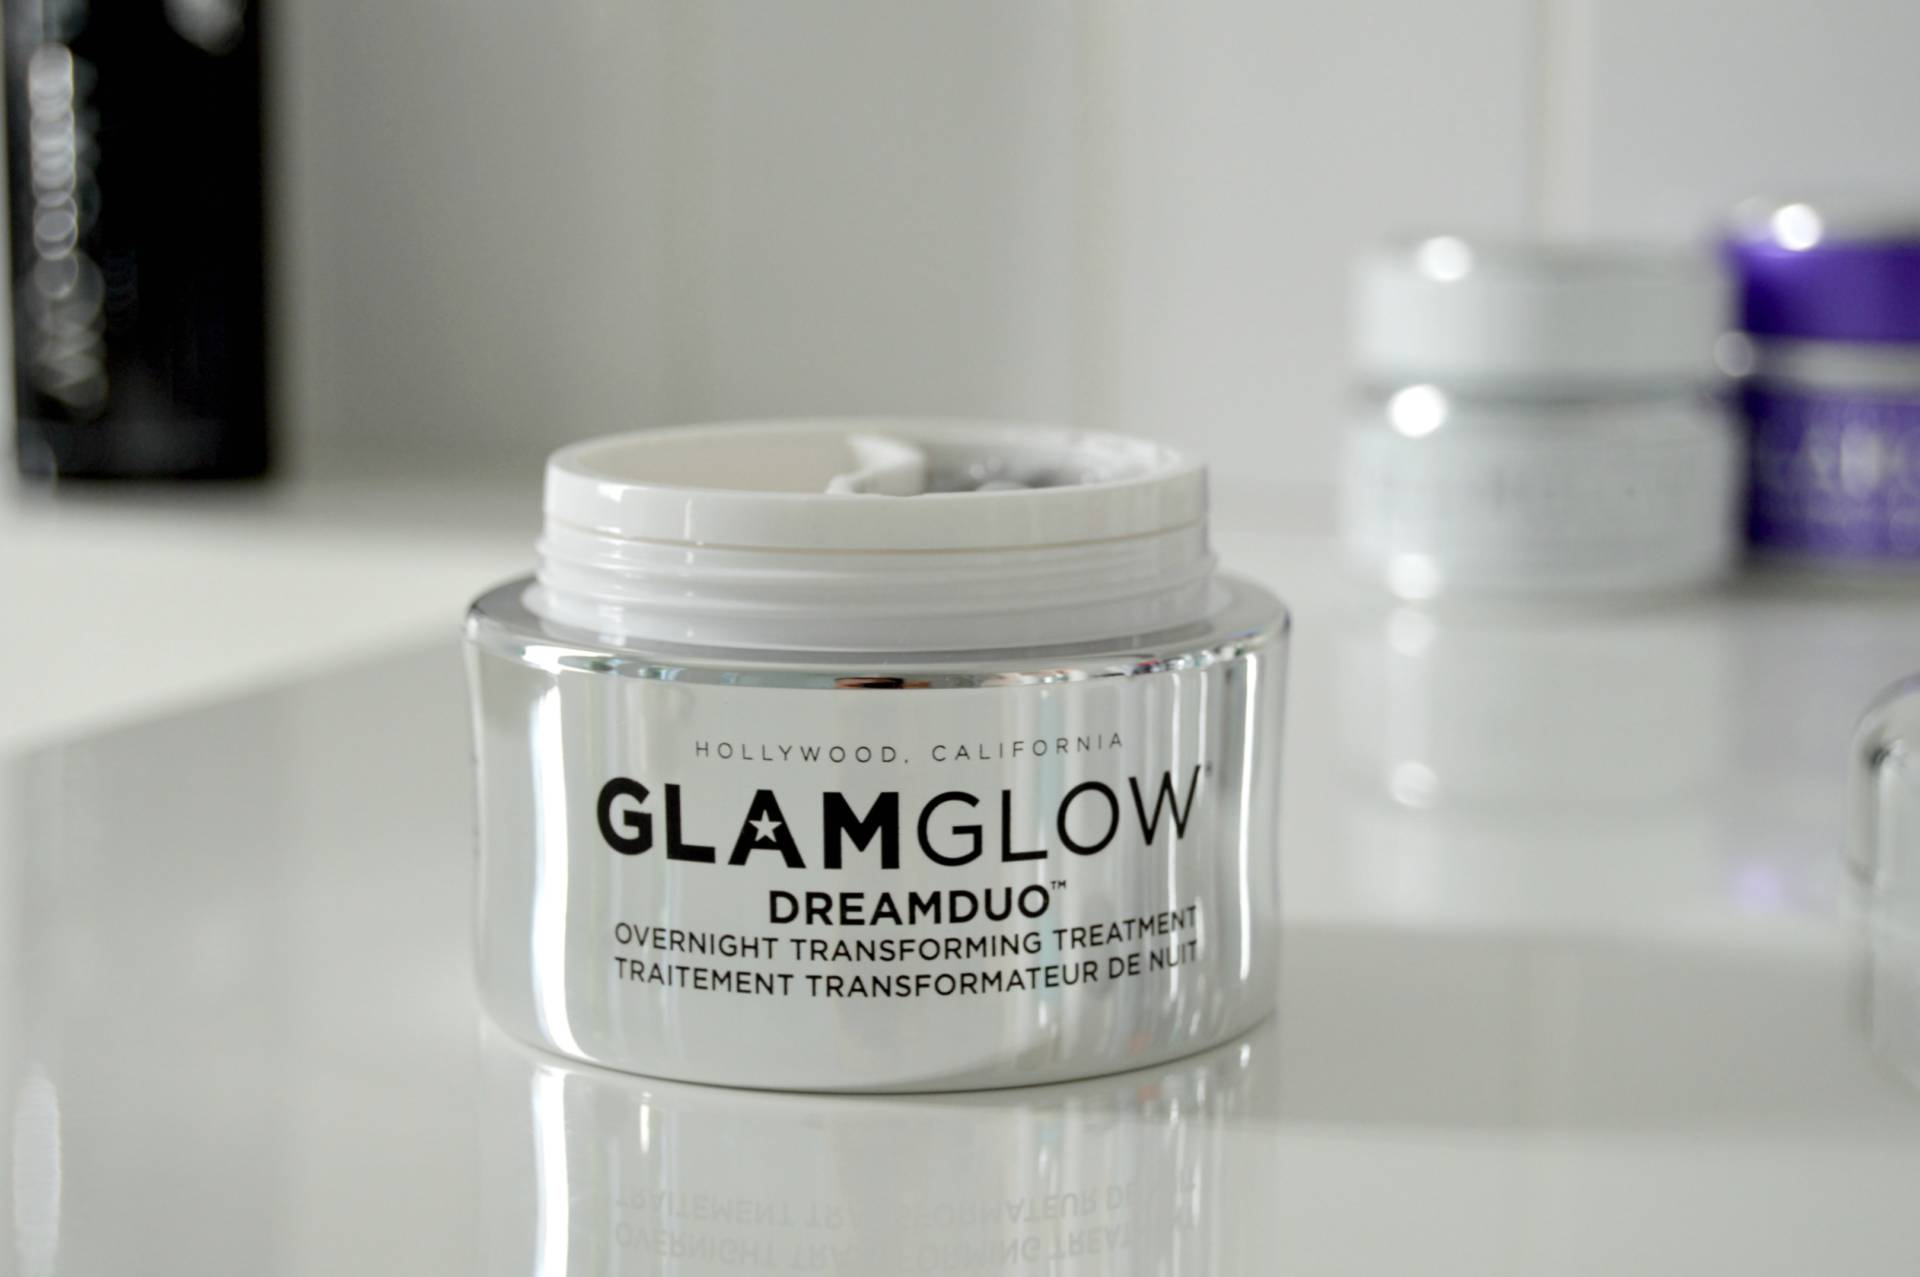 glamglow-dream-duo-hello-sexy-night-treatment-review-inhautepursuit